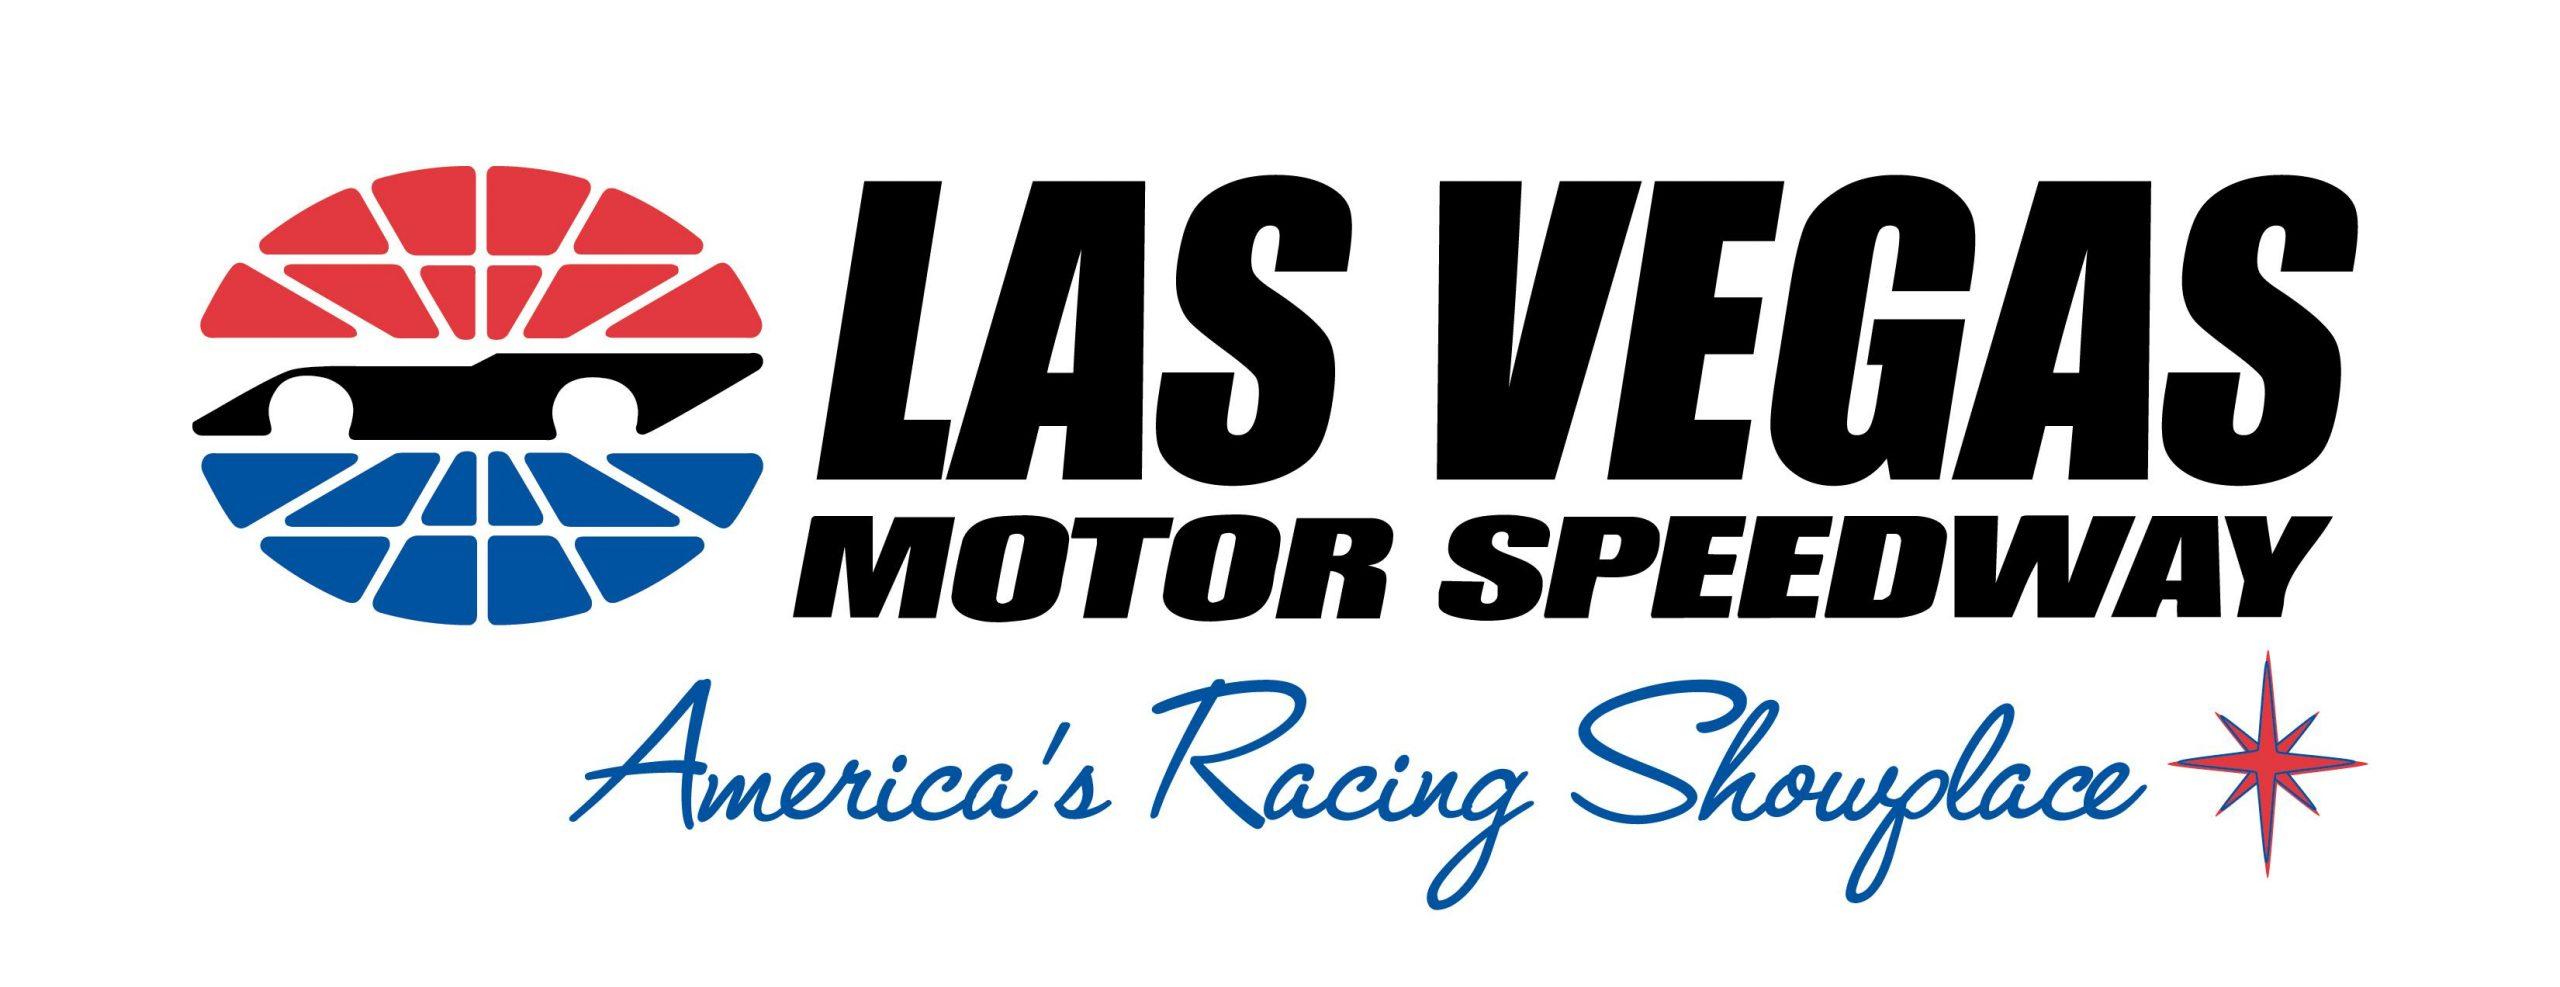 Raiding the Rock Vault to Perform Before Kobalt 400 at Las Vegas Motor Speedway March 12